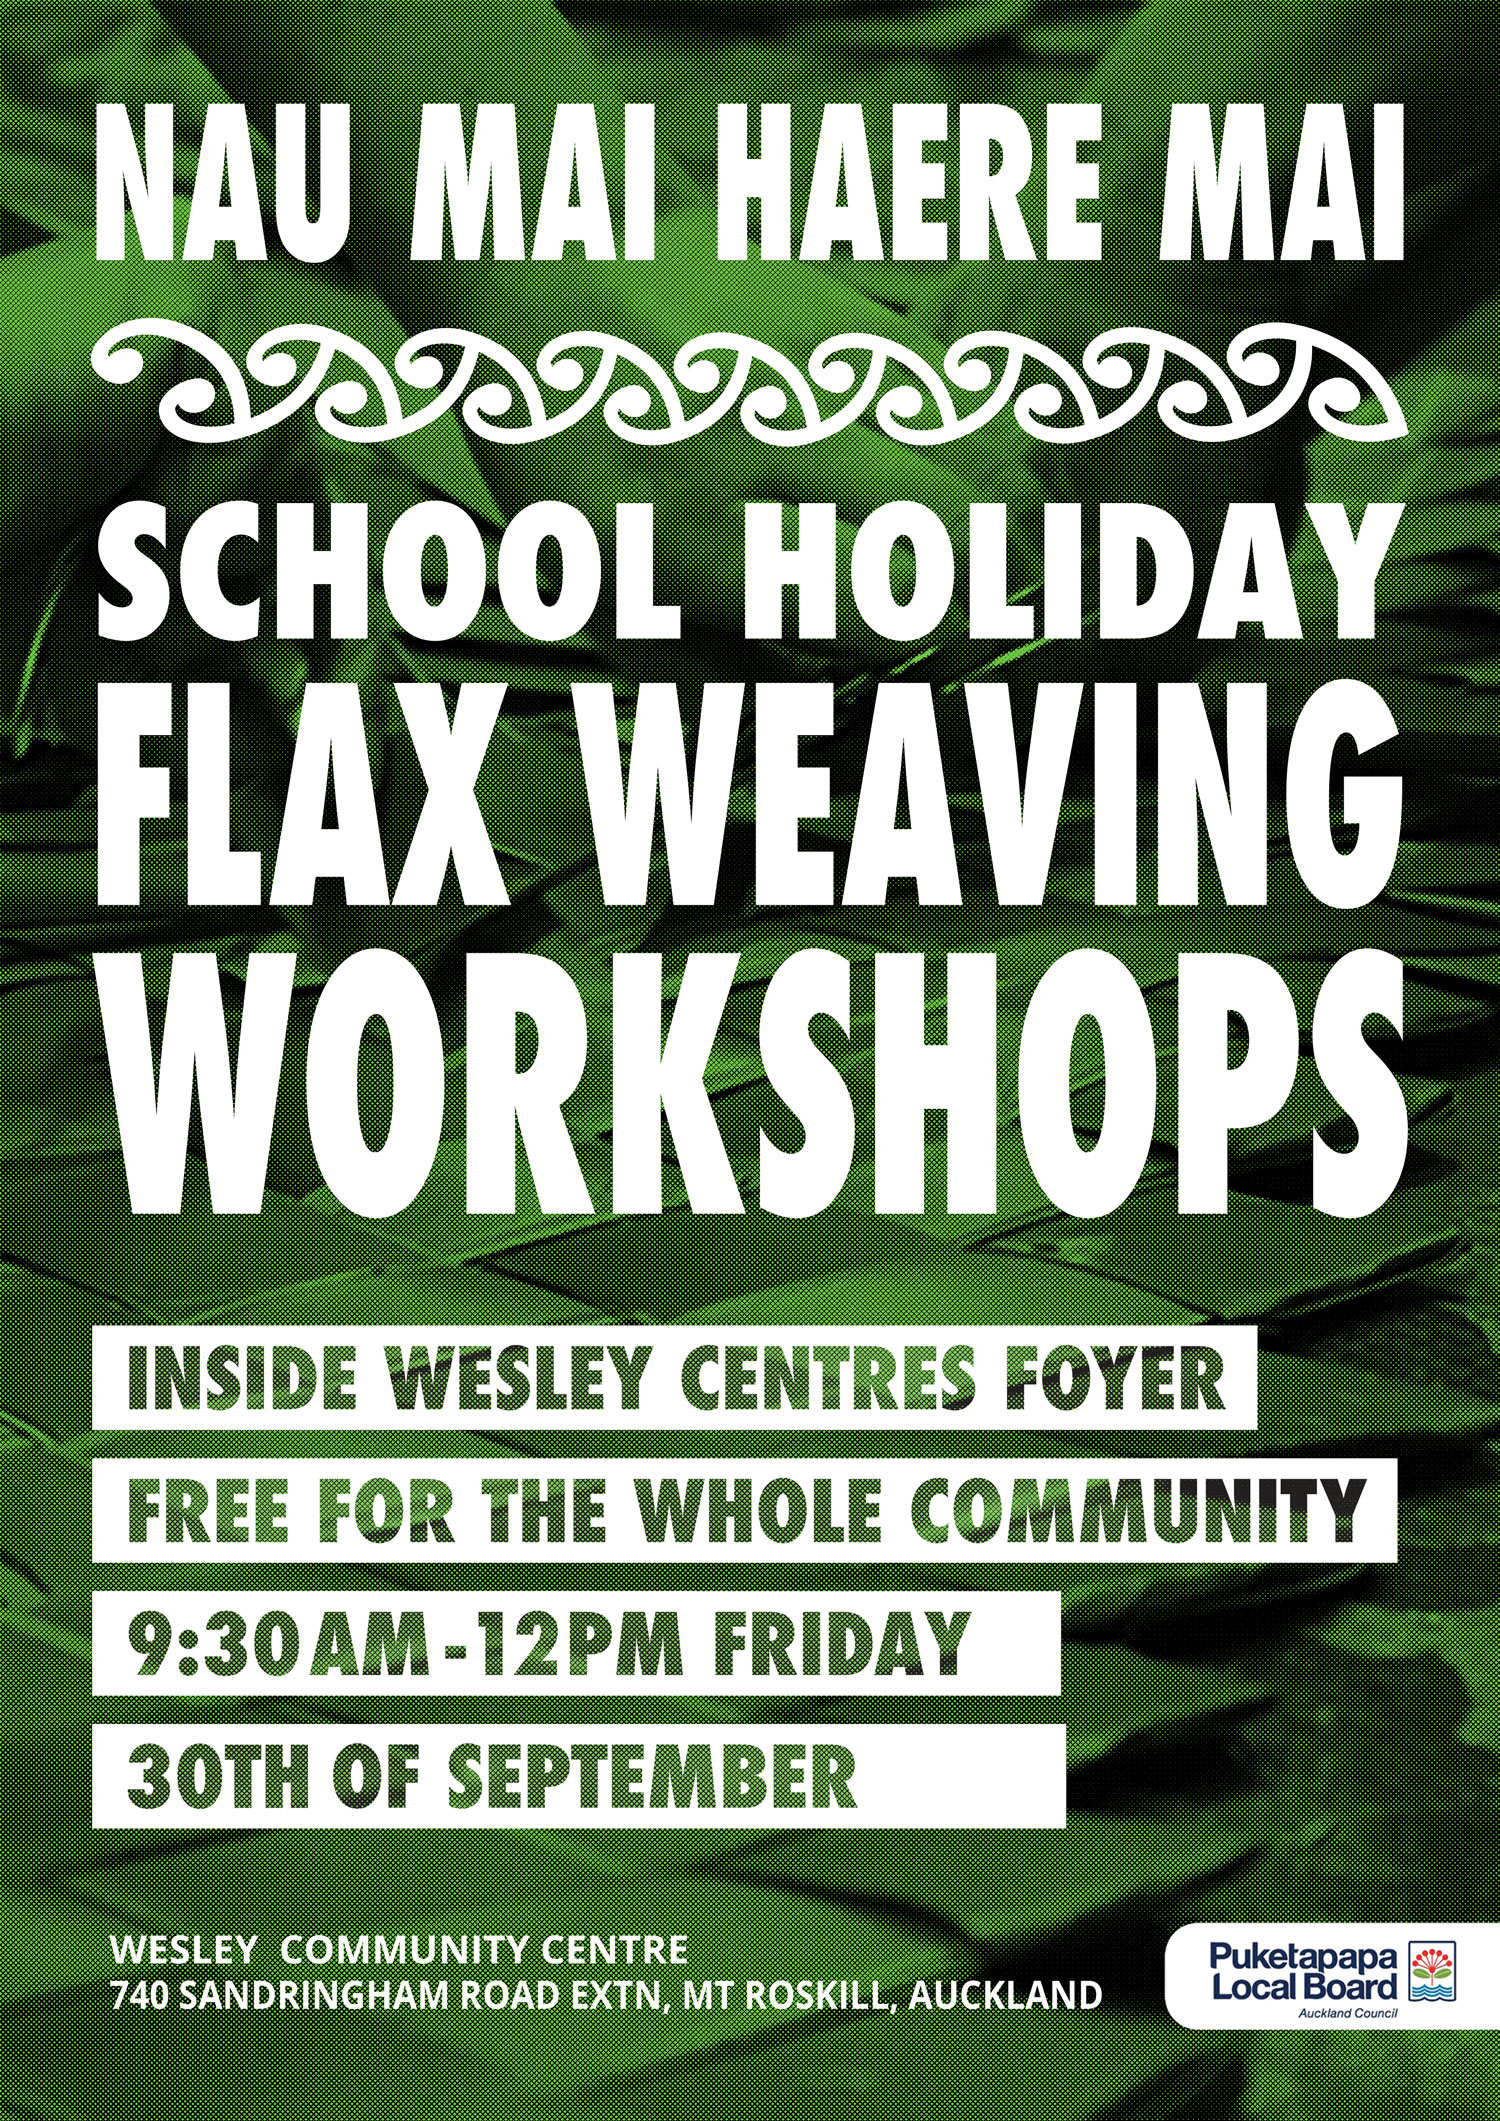 School-Holidays-Flax-Weaving.jpg